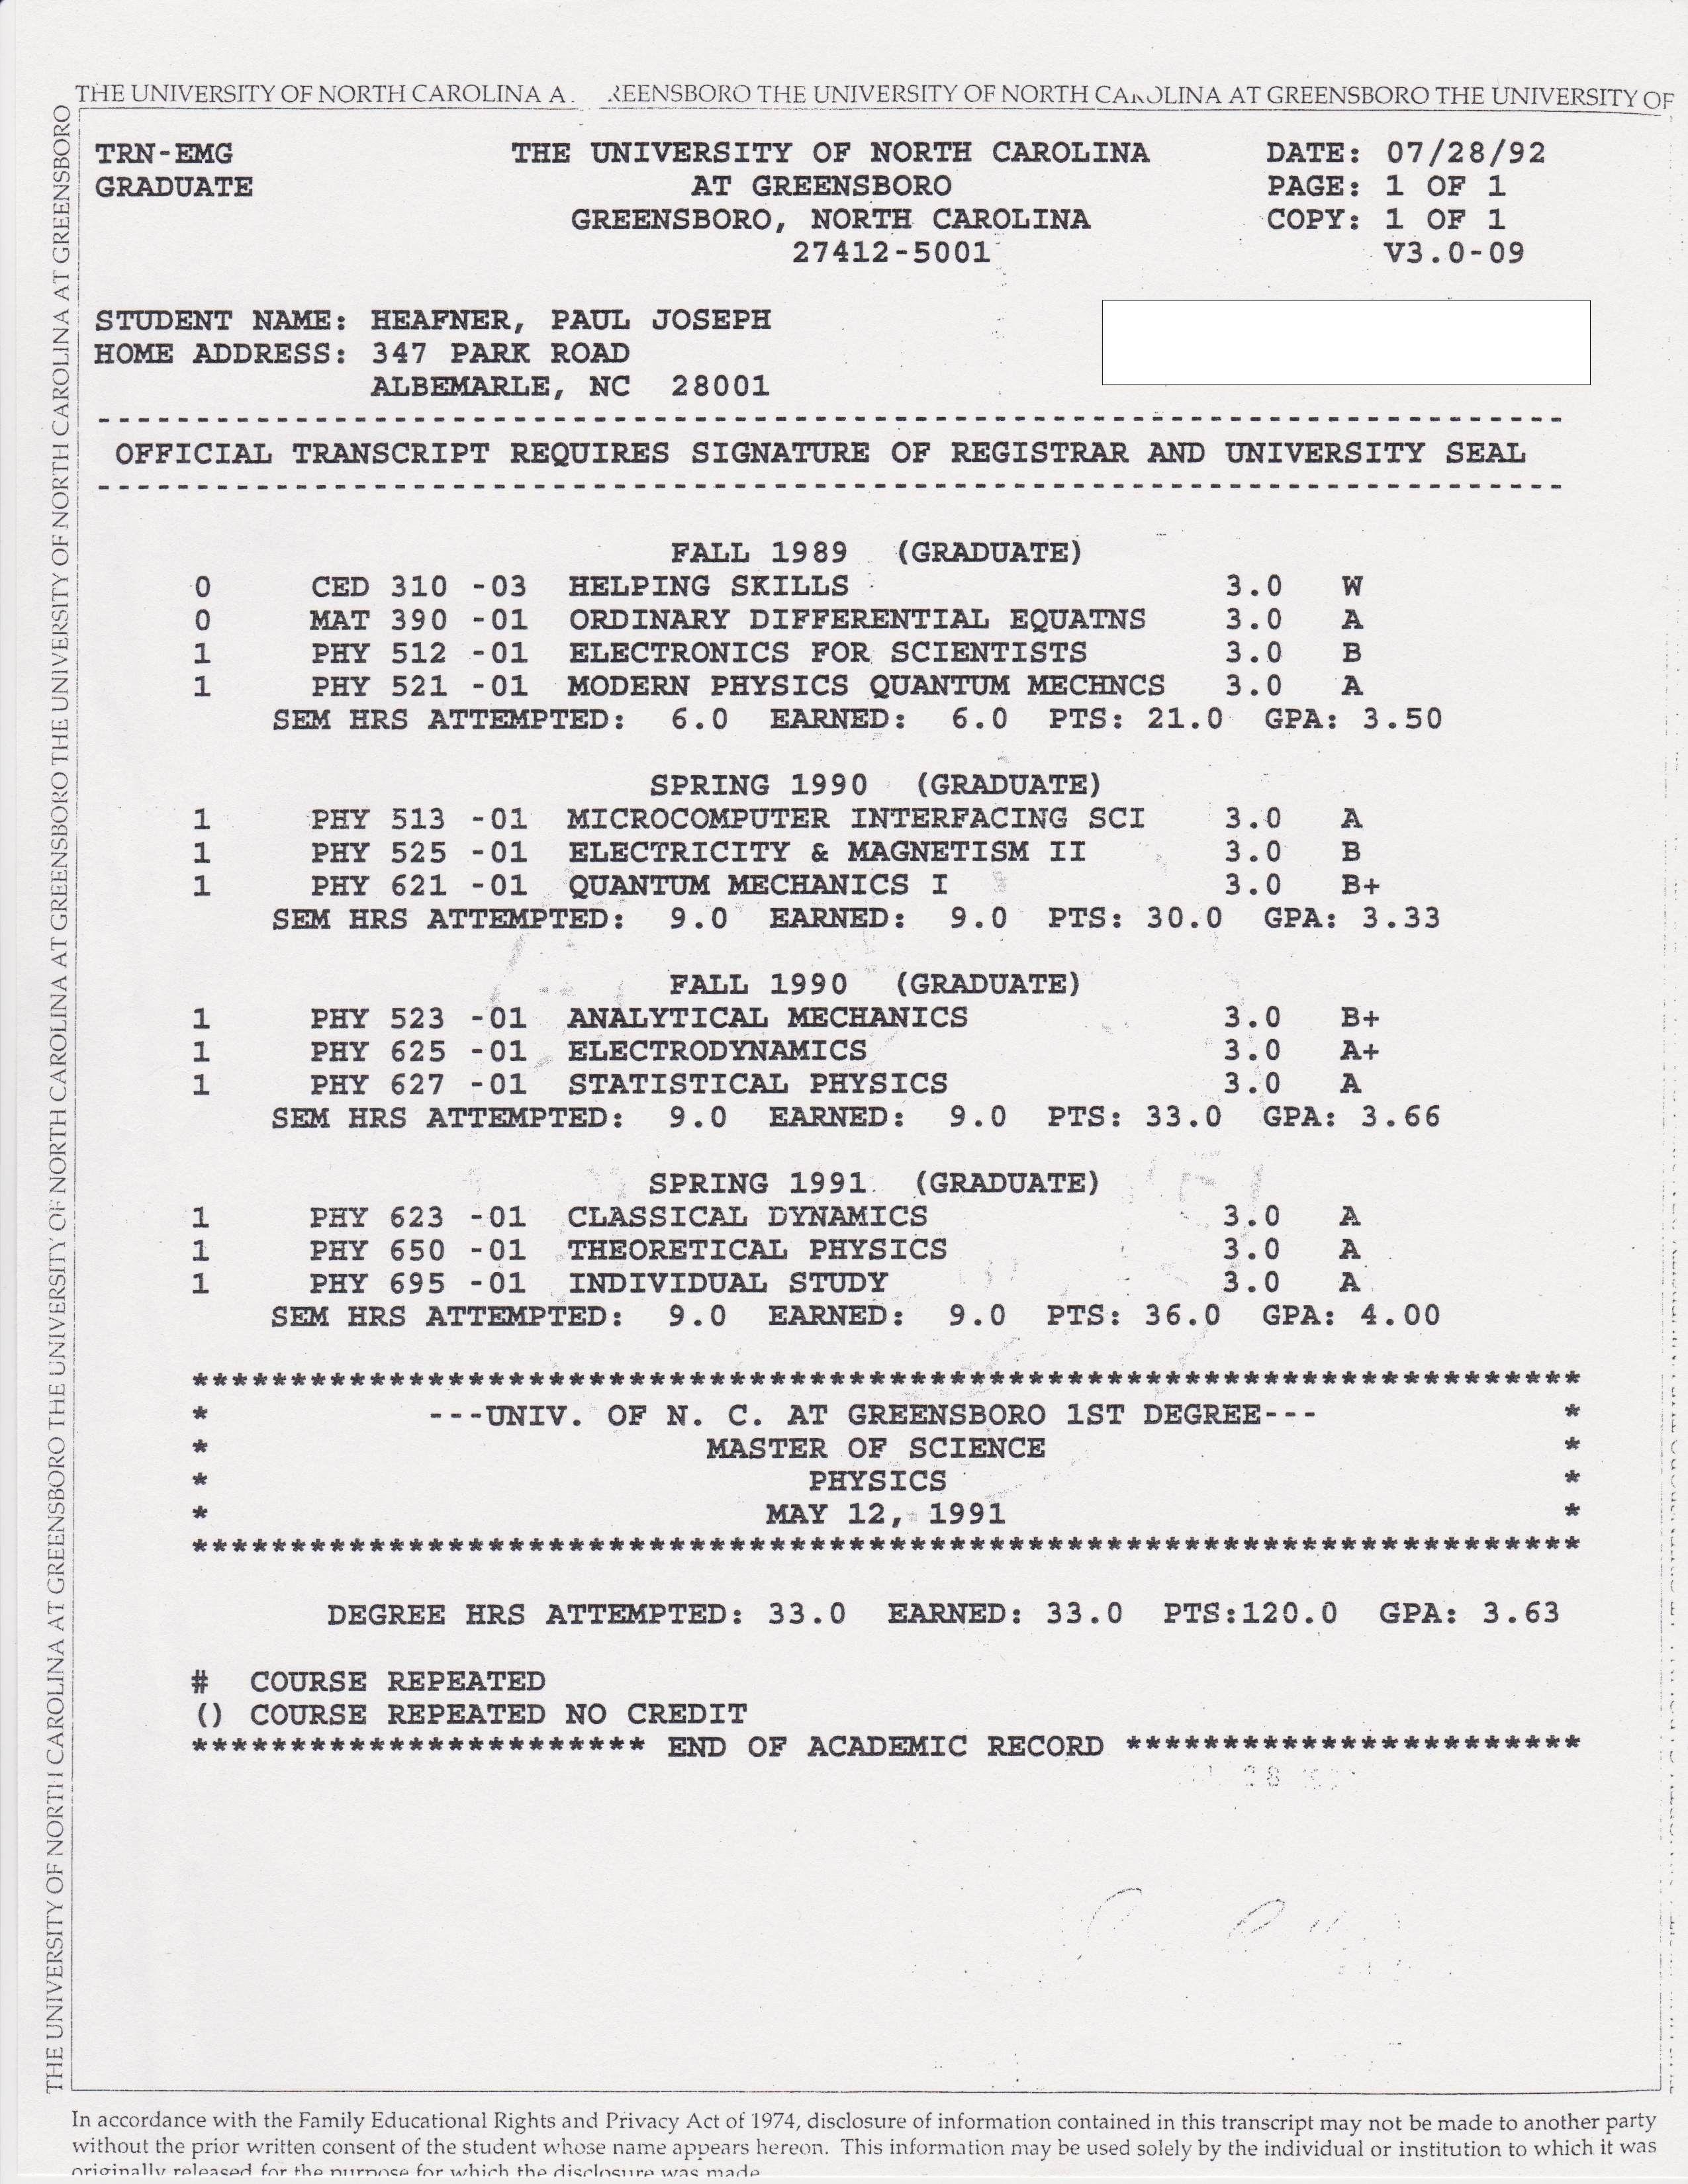 Graduate Transcript